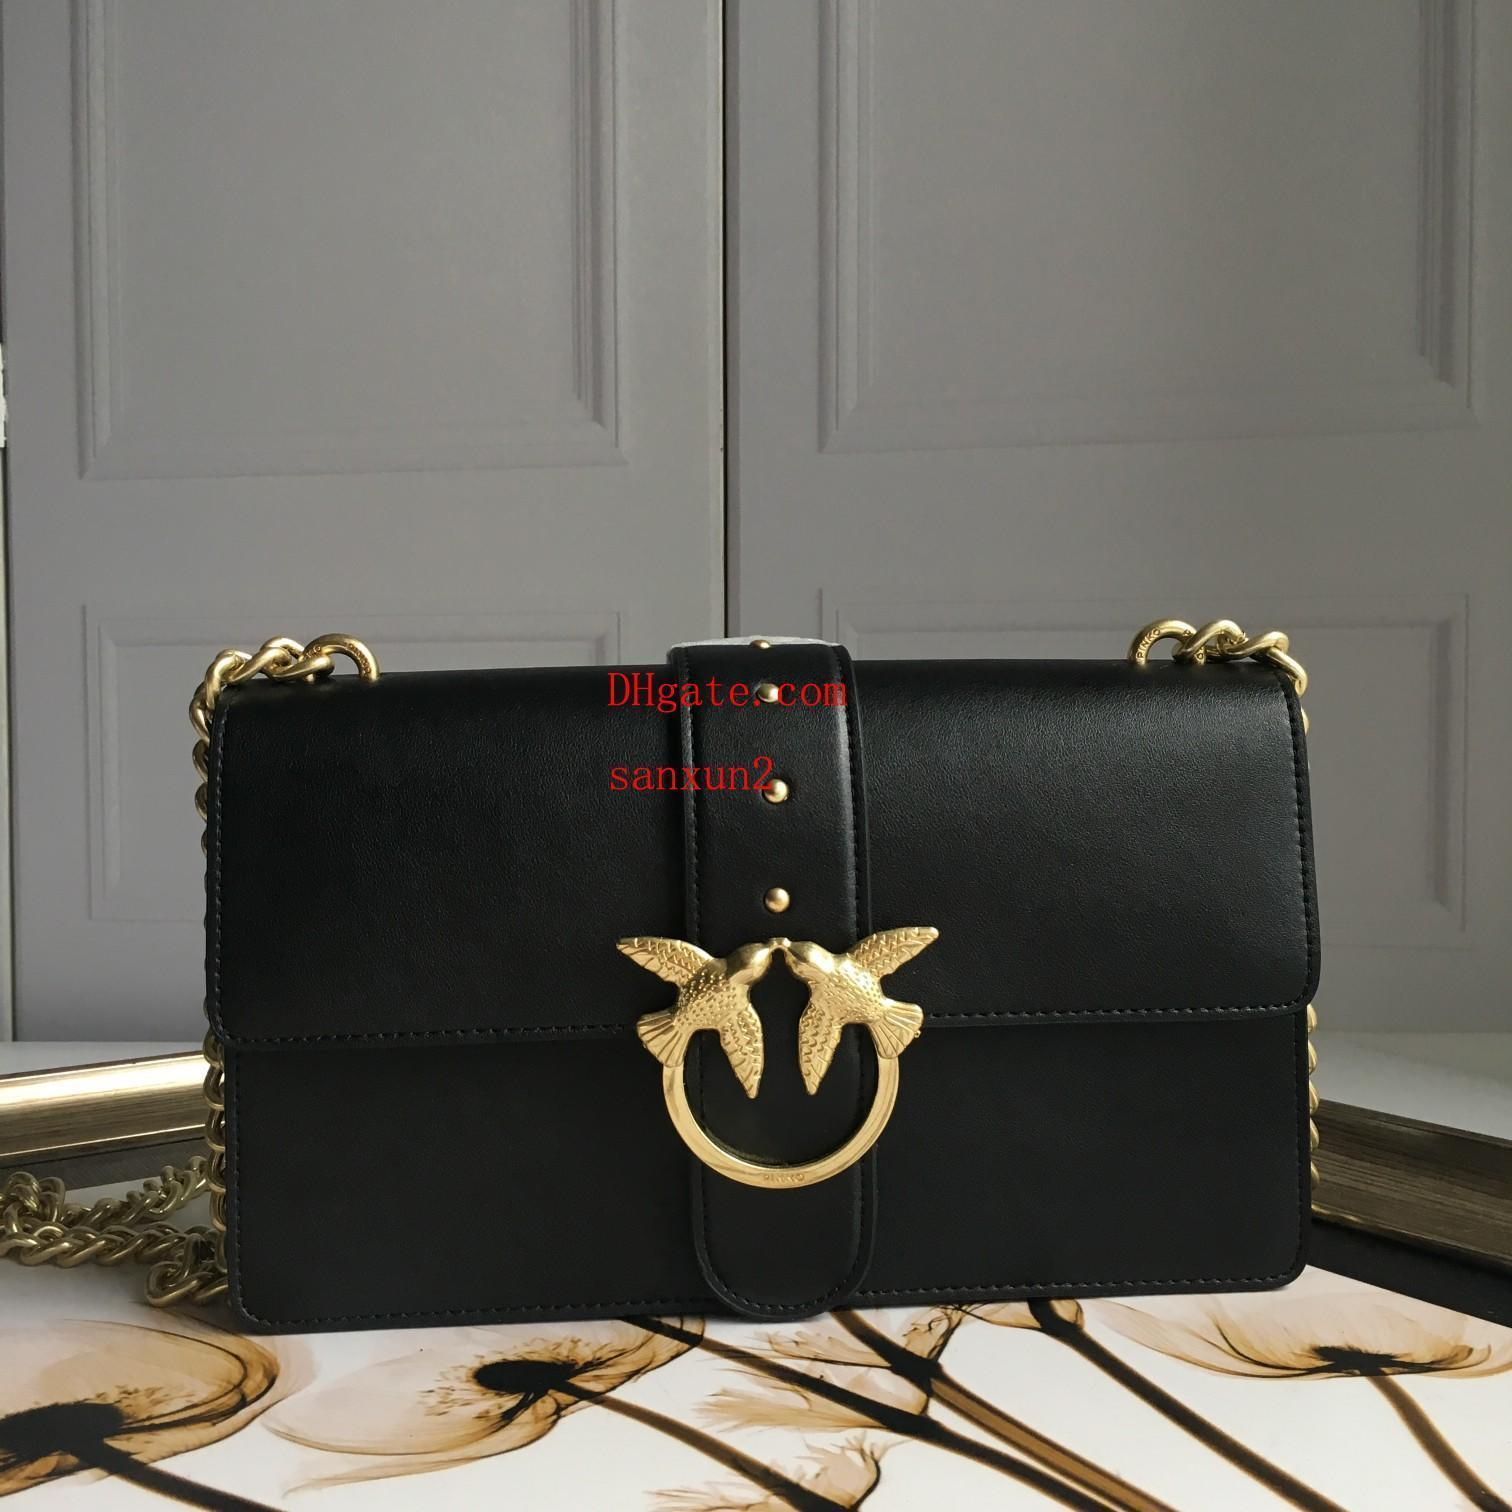 e68b75009ed Brand Fashion Women Female Shoulder Bag Crossbody Sac à main handbags  makeup toiletry bag Pouch Small Chain Messenger Bag C-oc4